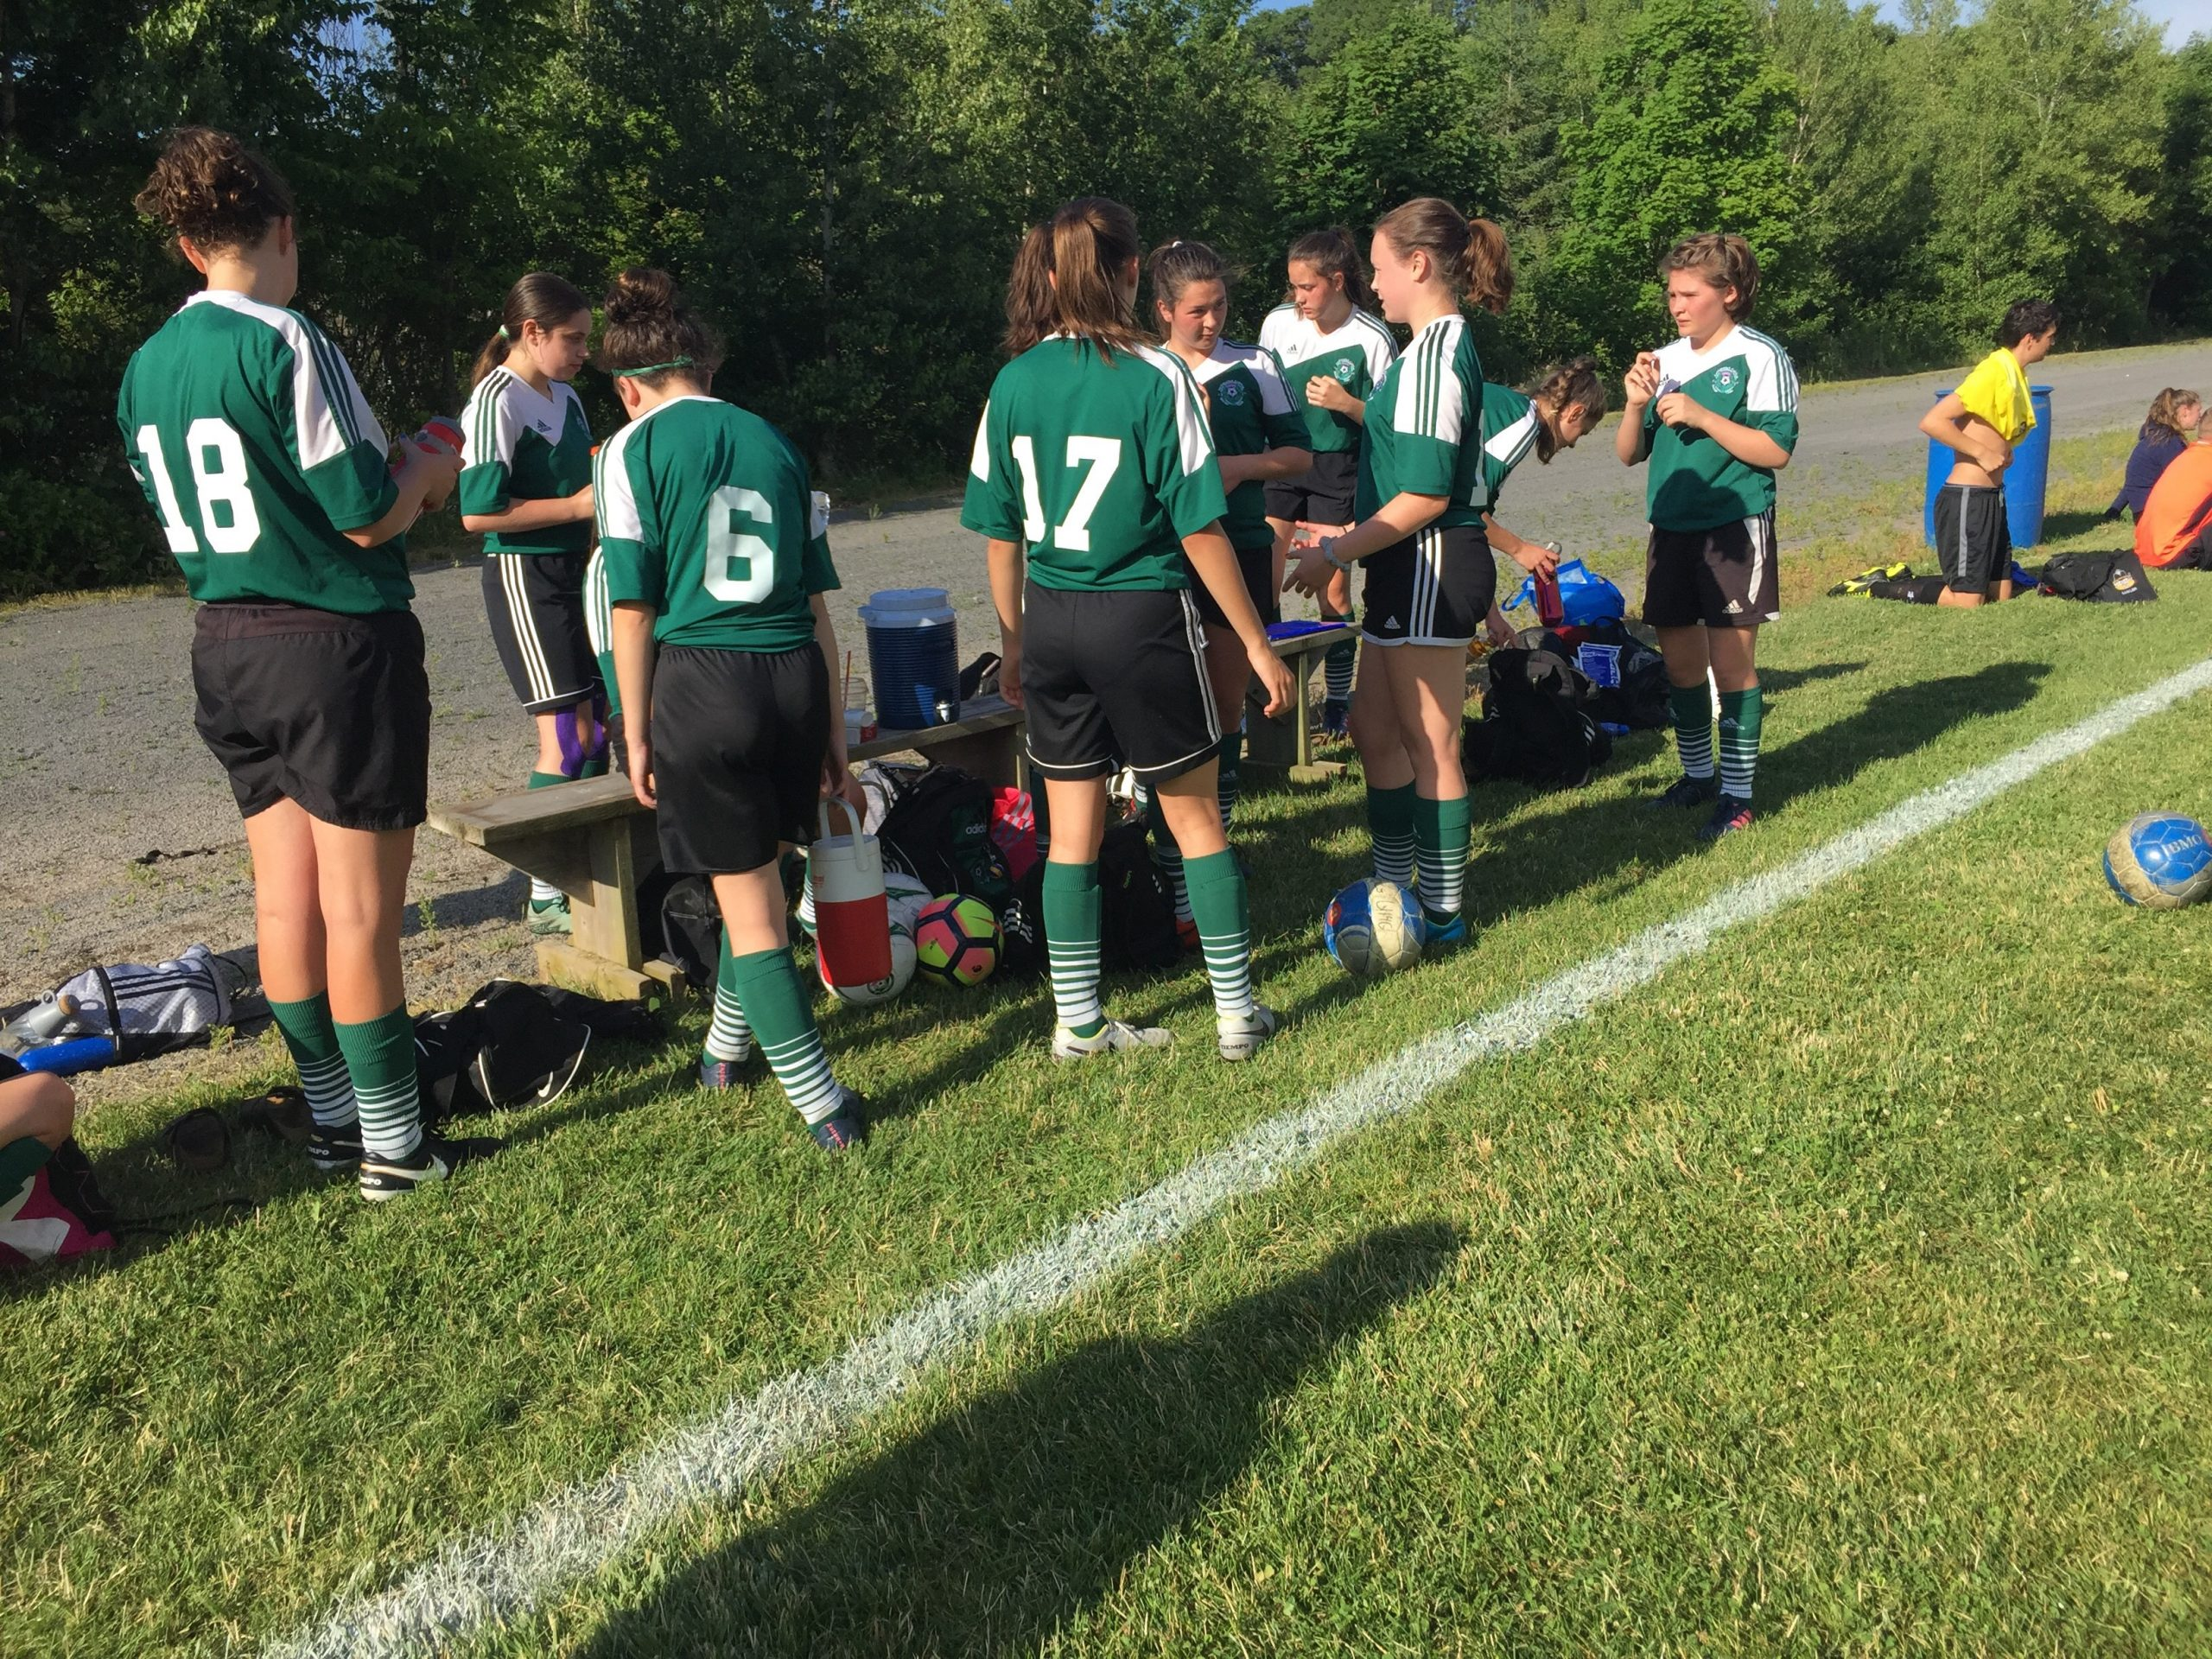 Gunn Tournament U15 girls Soccer (from Kentville Friday)